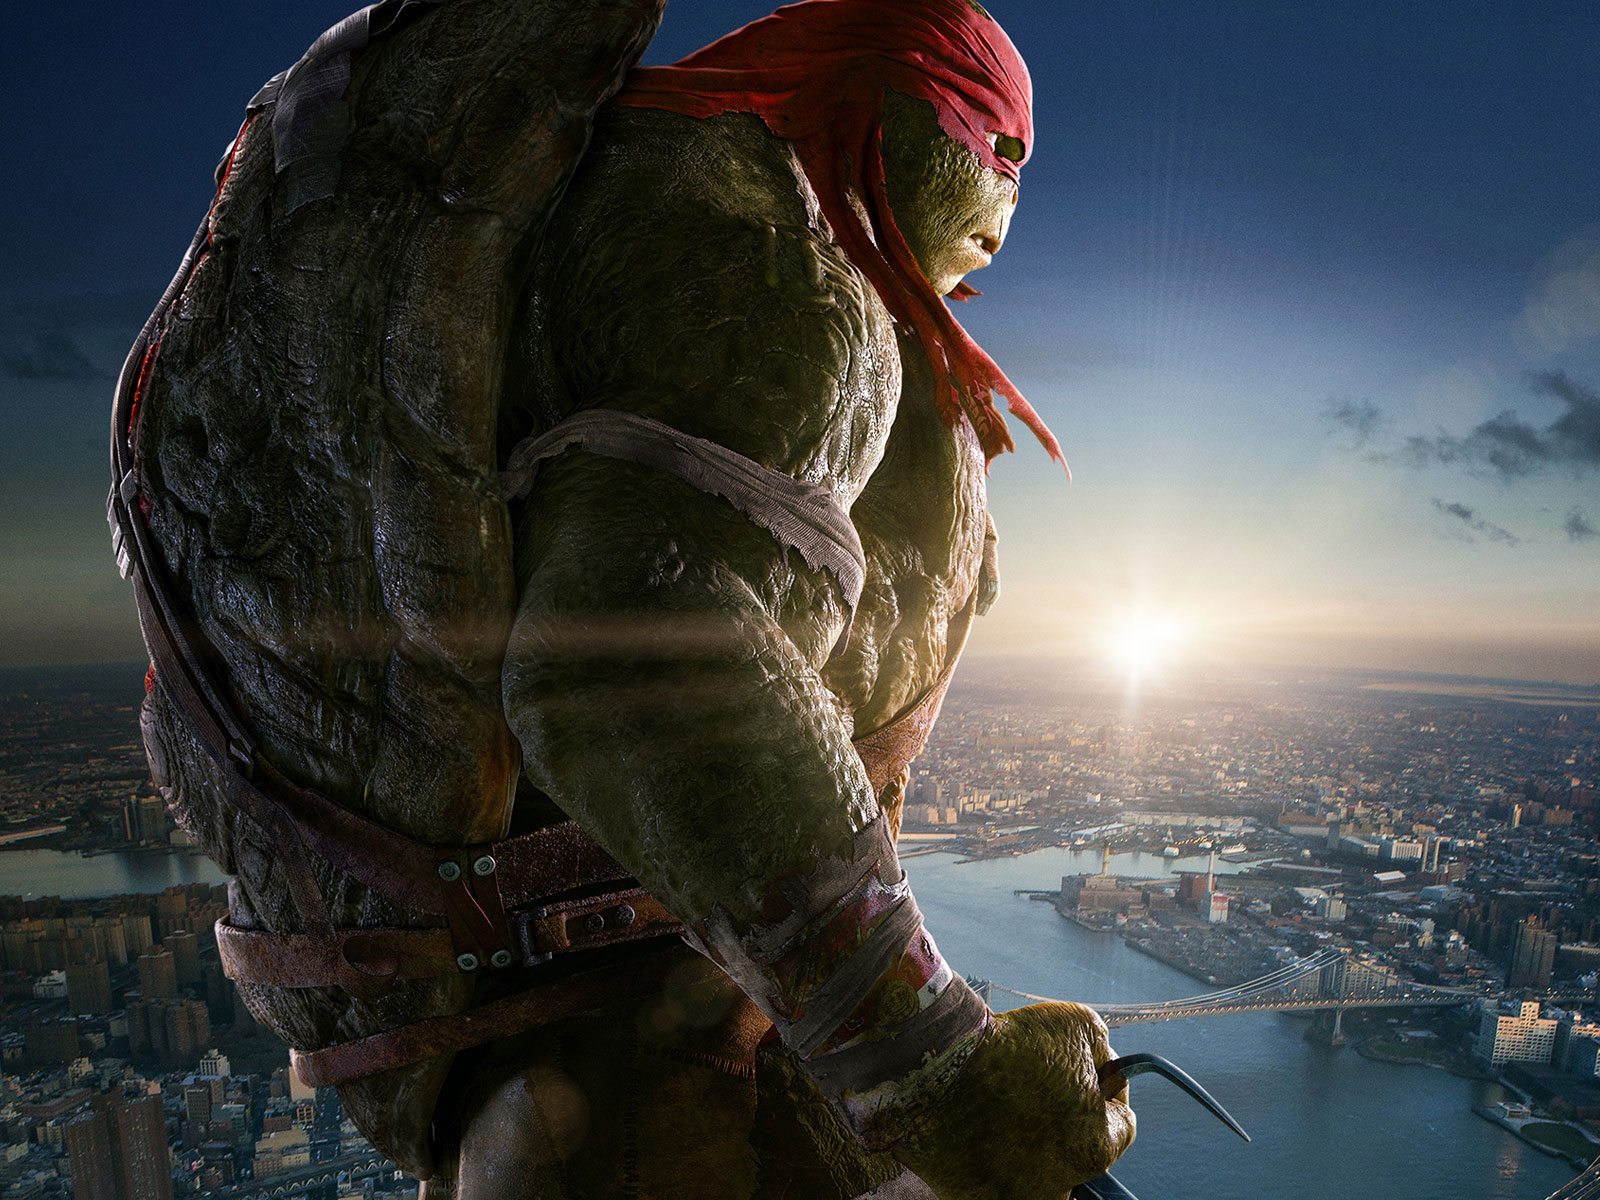 Mutant Ninja Turtles TMNT 2014 HD Desktop iPhone iPad Wallpapers 1600x1200